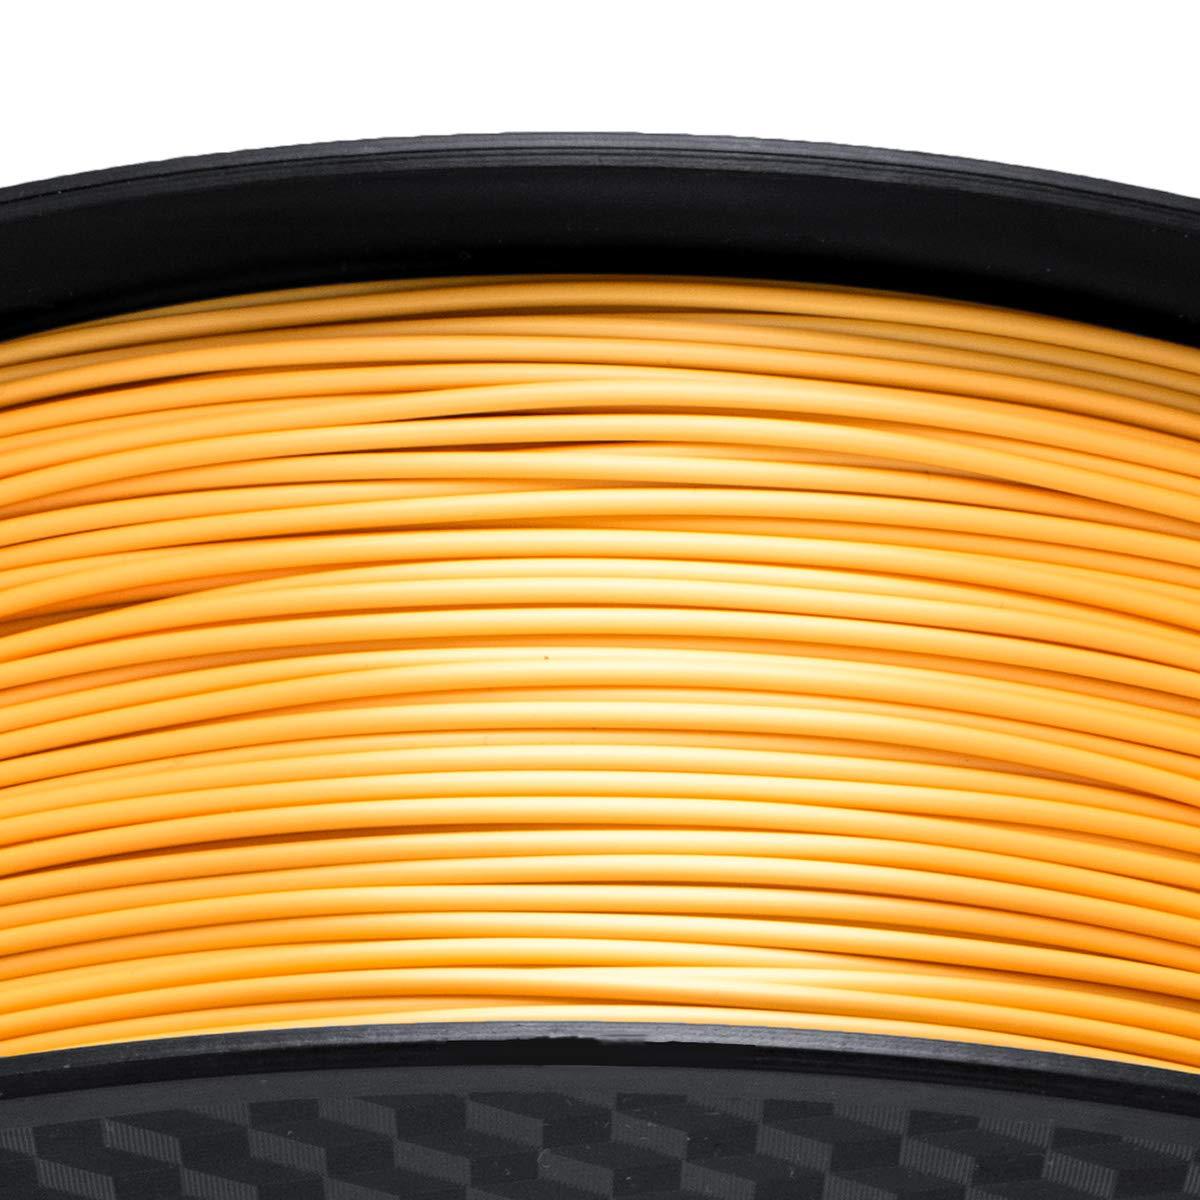 PLA 3D Printer Filament,Geeetech 3D Printer Silk Copper,Gold and Silver PLA Filament,1.75mm,per 0.5kg Spool,Pack of 3 /…